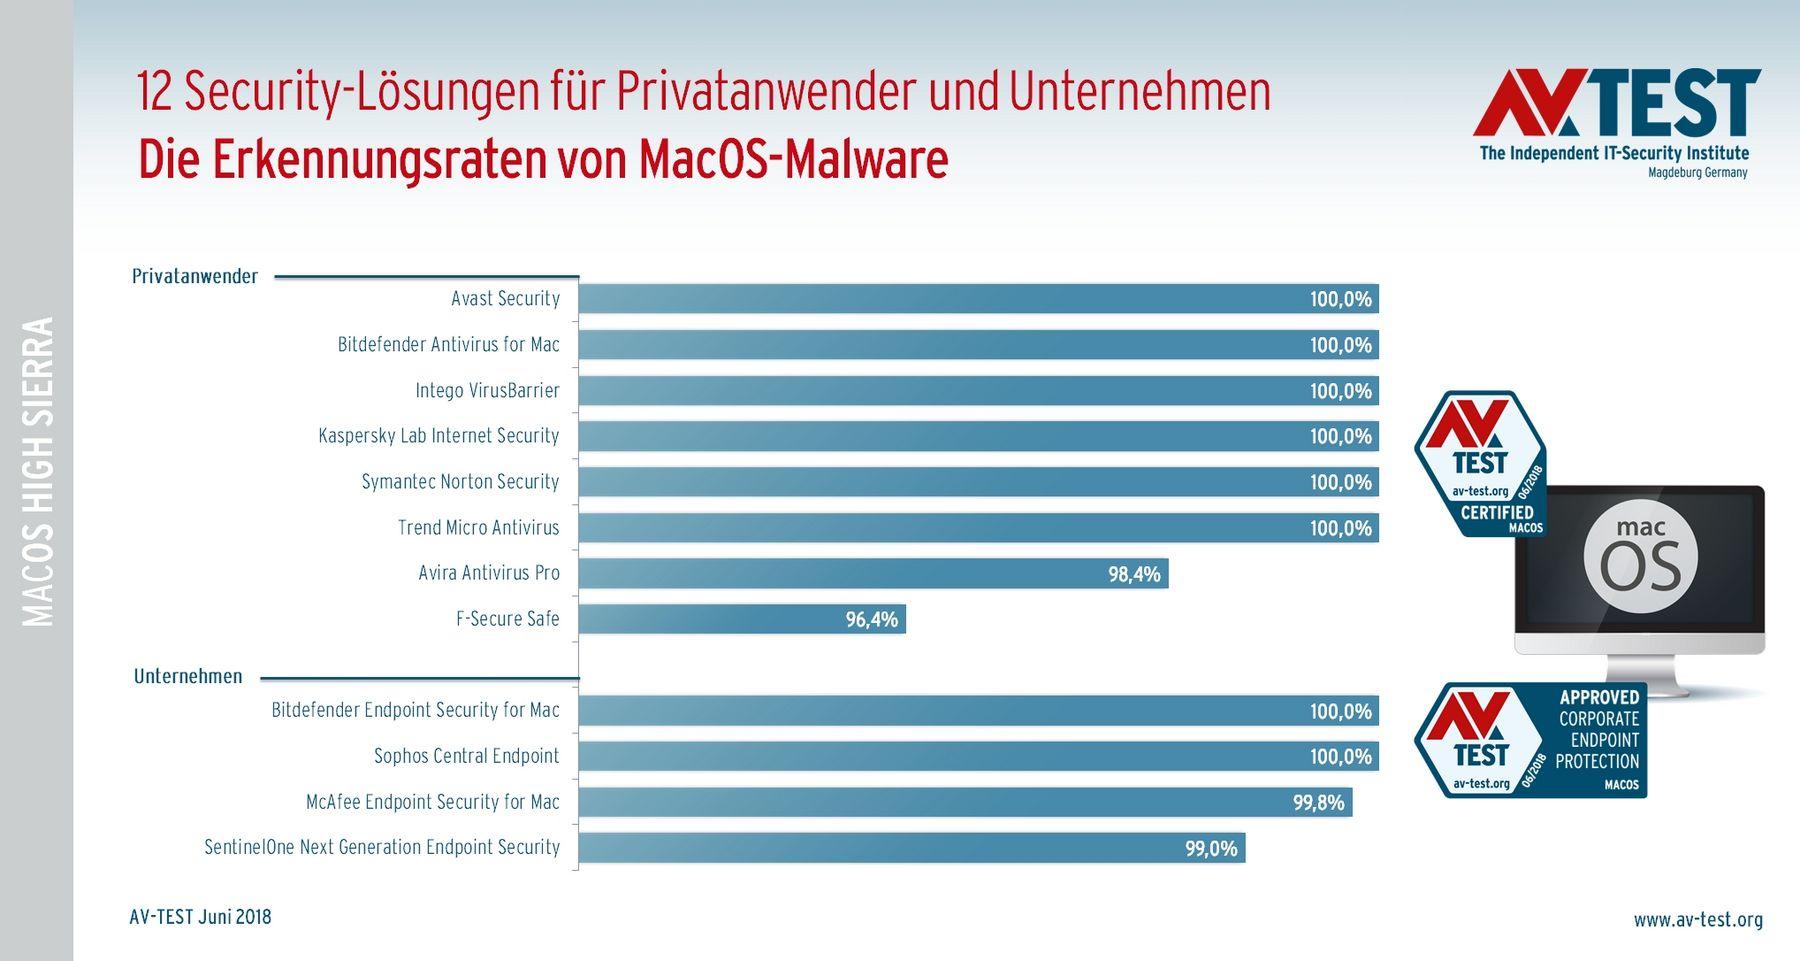 antivirenprogramm test mac